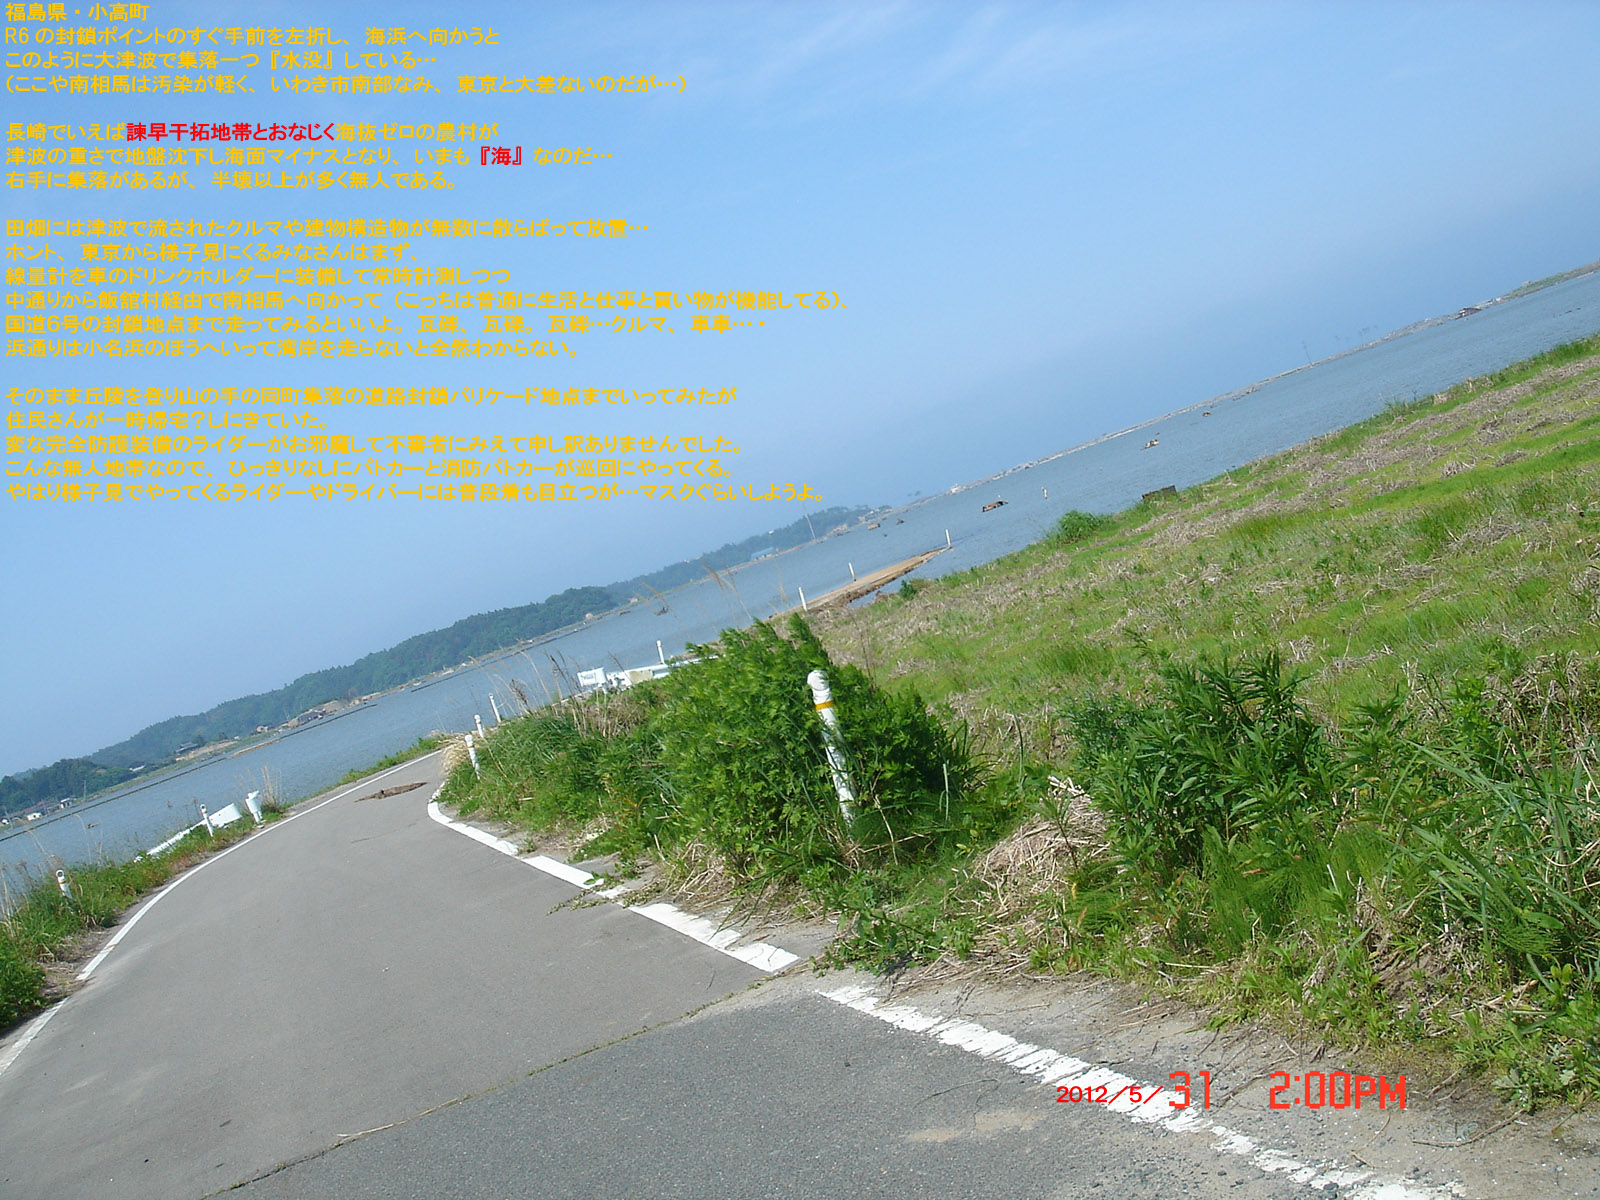 f:id:geasszero:20120601214944j:image